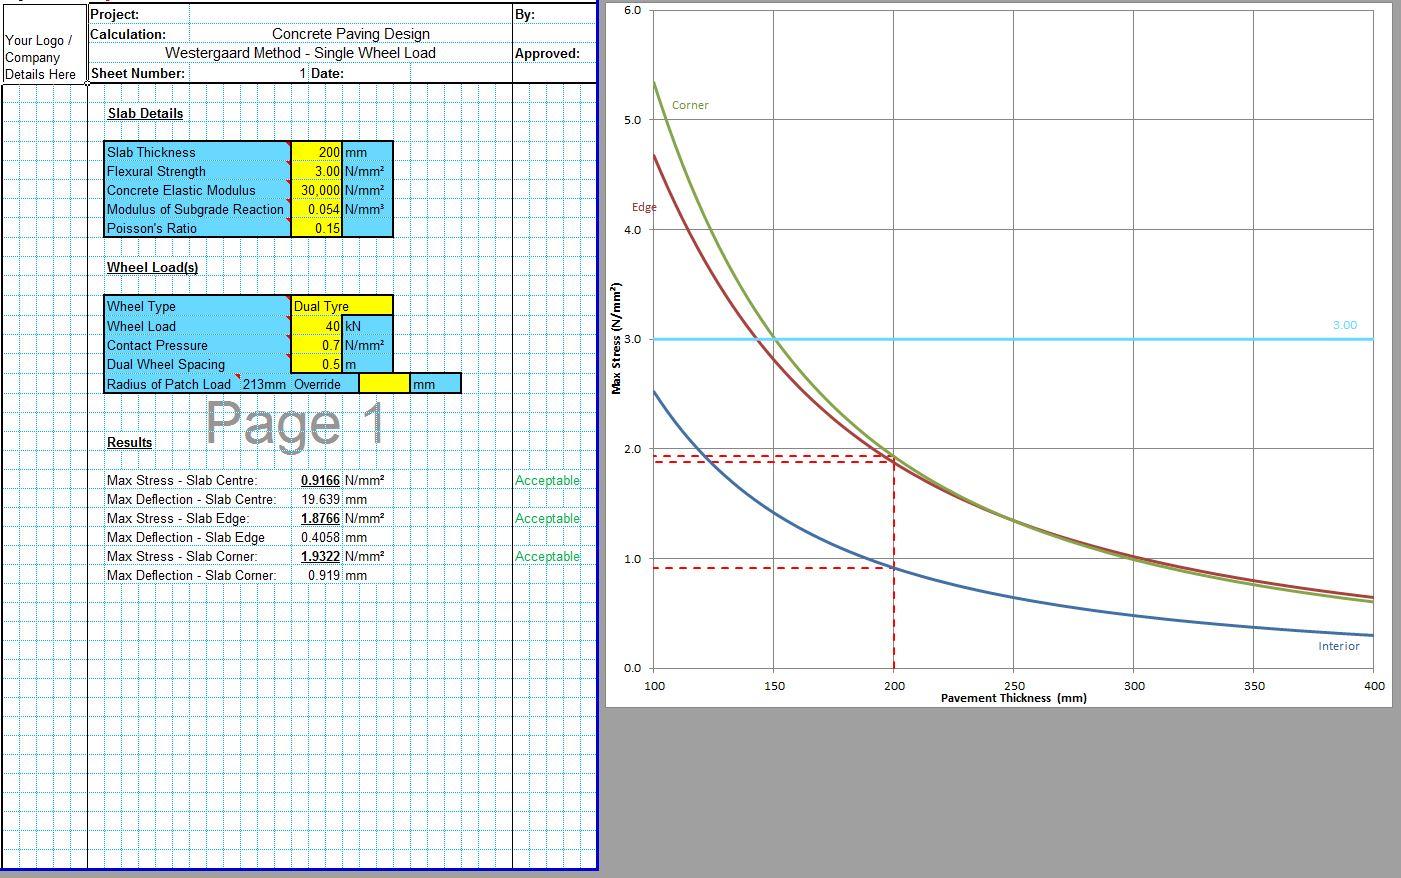 Westergaard Method For Rigid Pavement 1